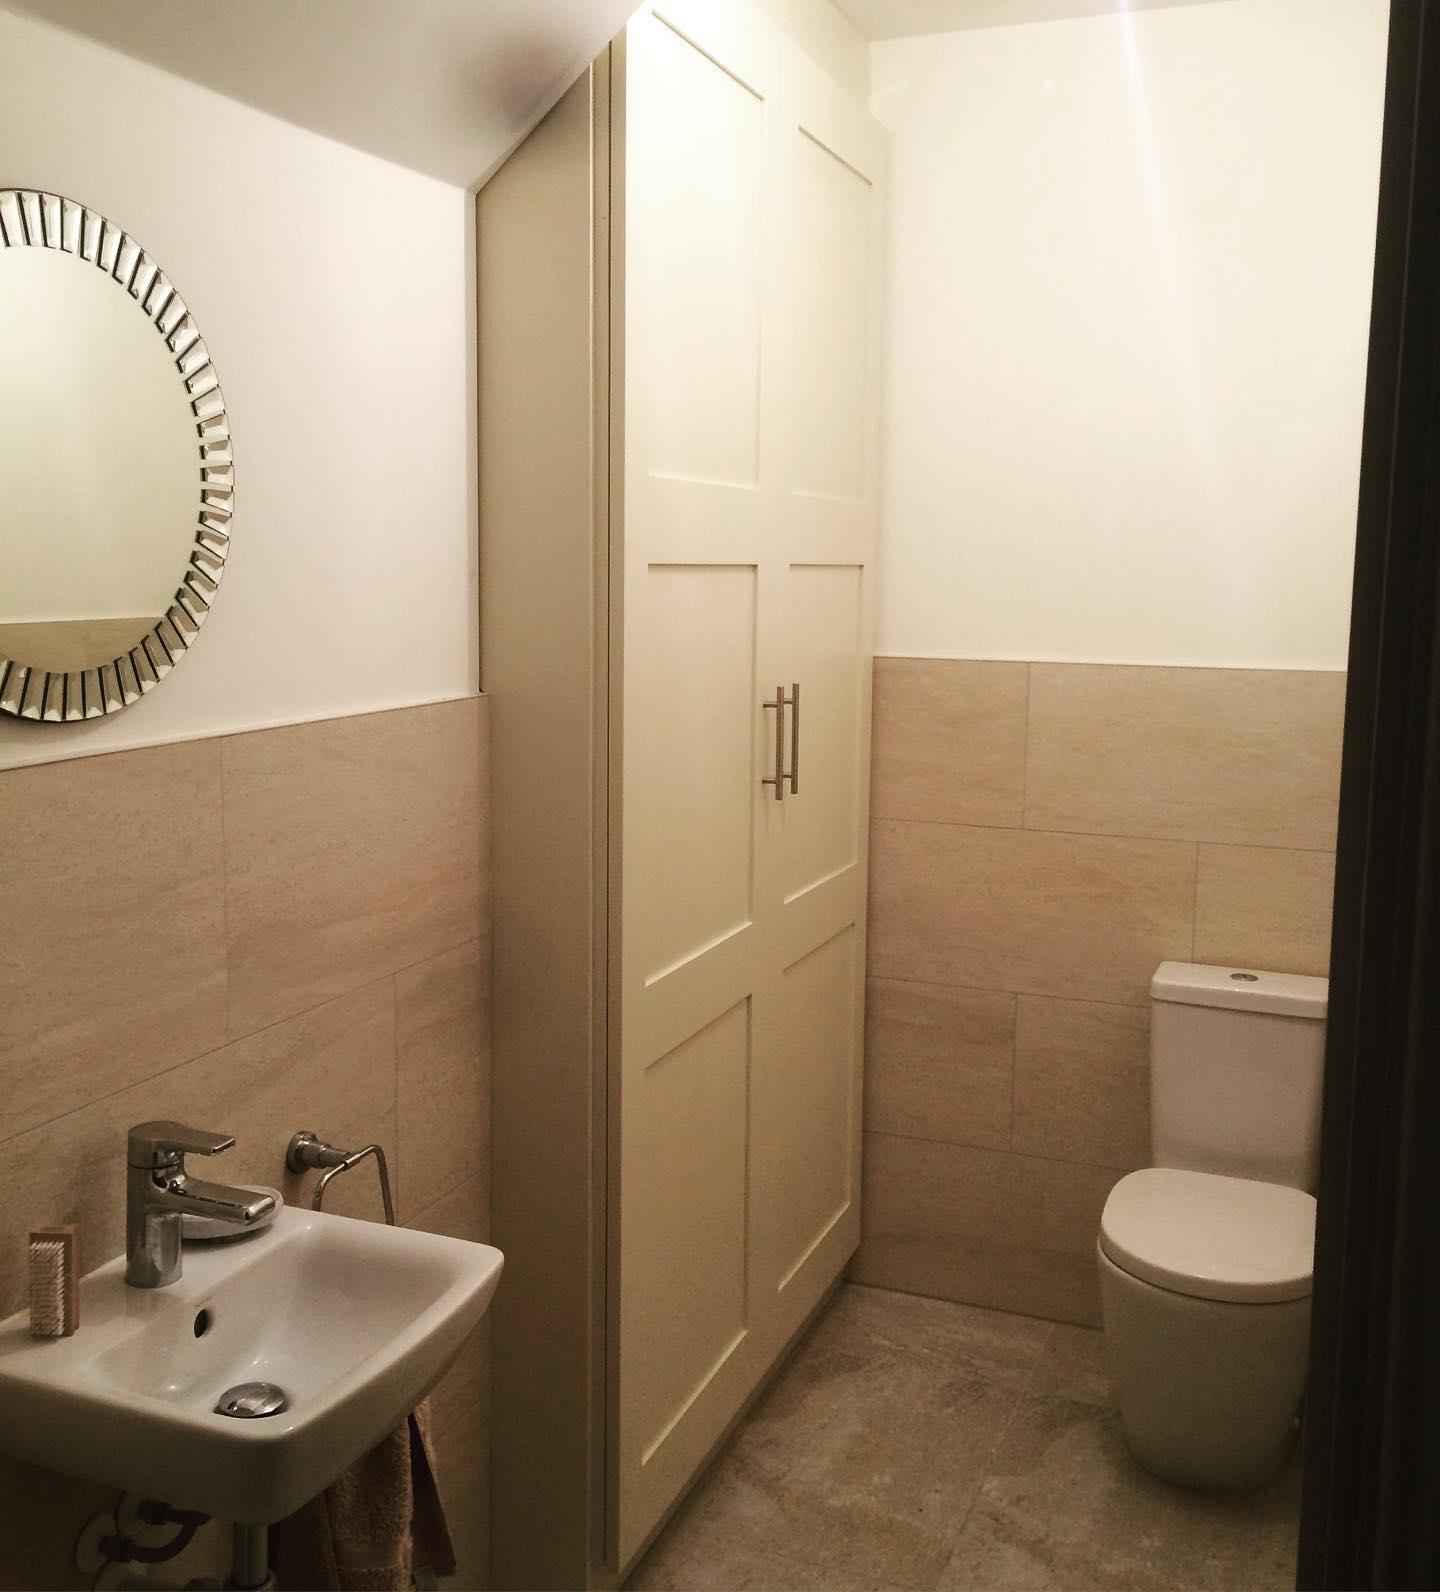 Fitted bathroom storage cupboard